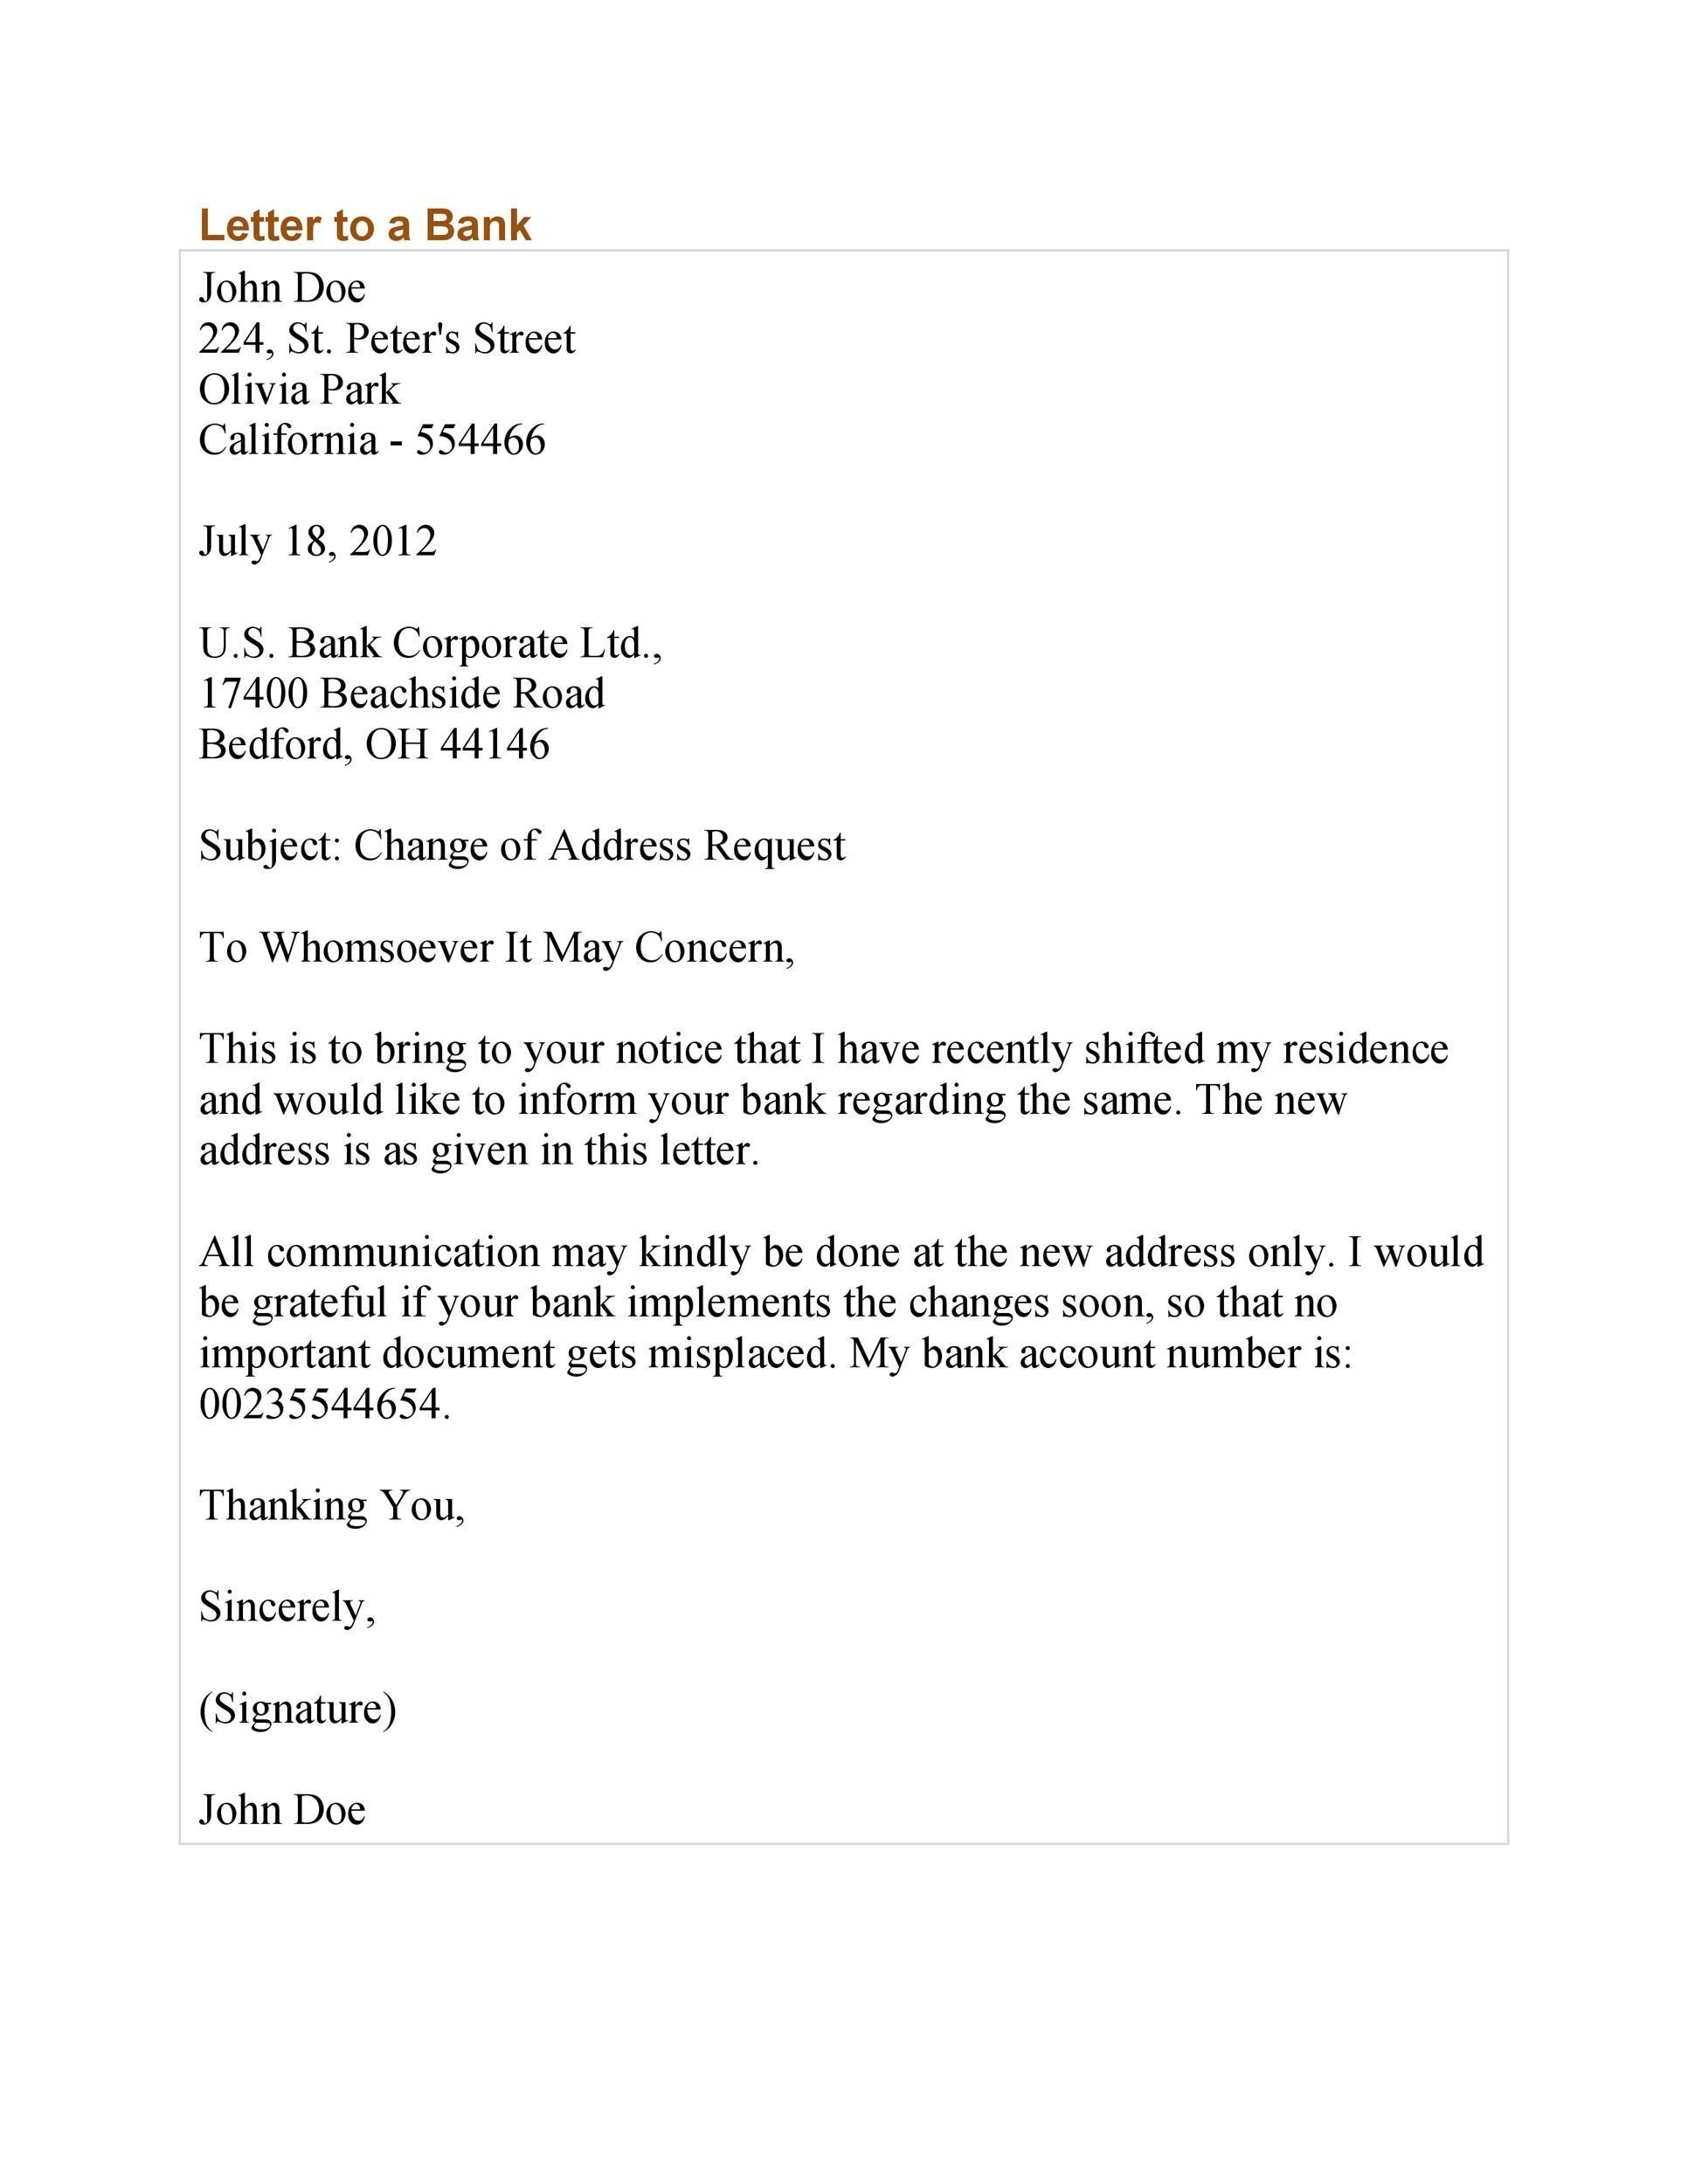 Free change of address letter 16